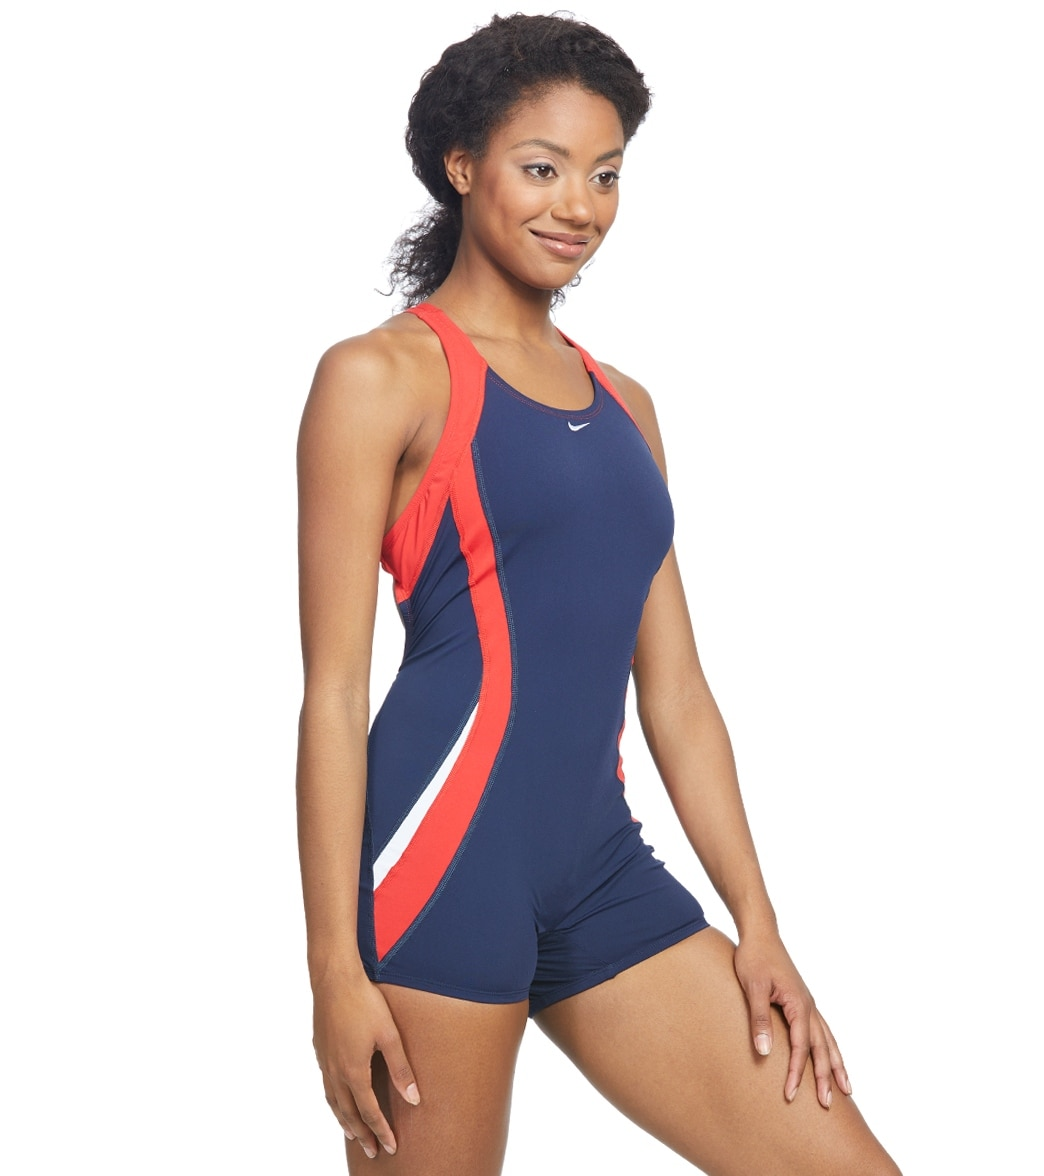 2590947a176 Nike Women s Color Surge Powerback Unitard at SwimOutlet.com - Free ...